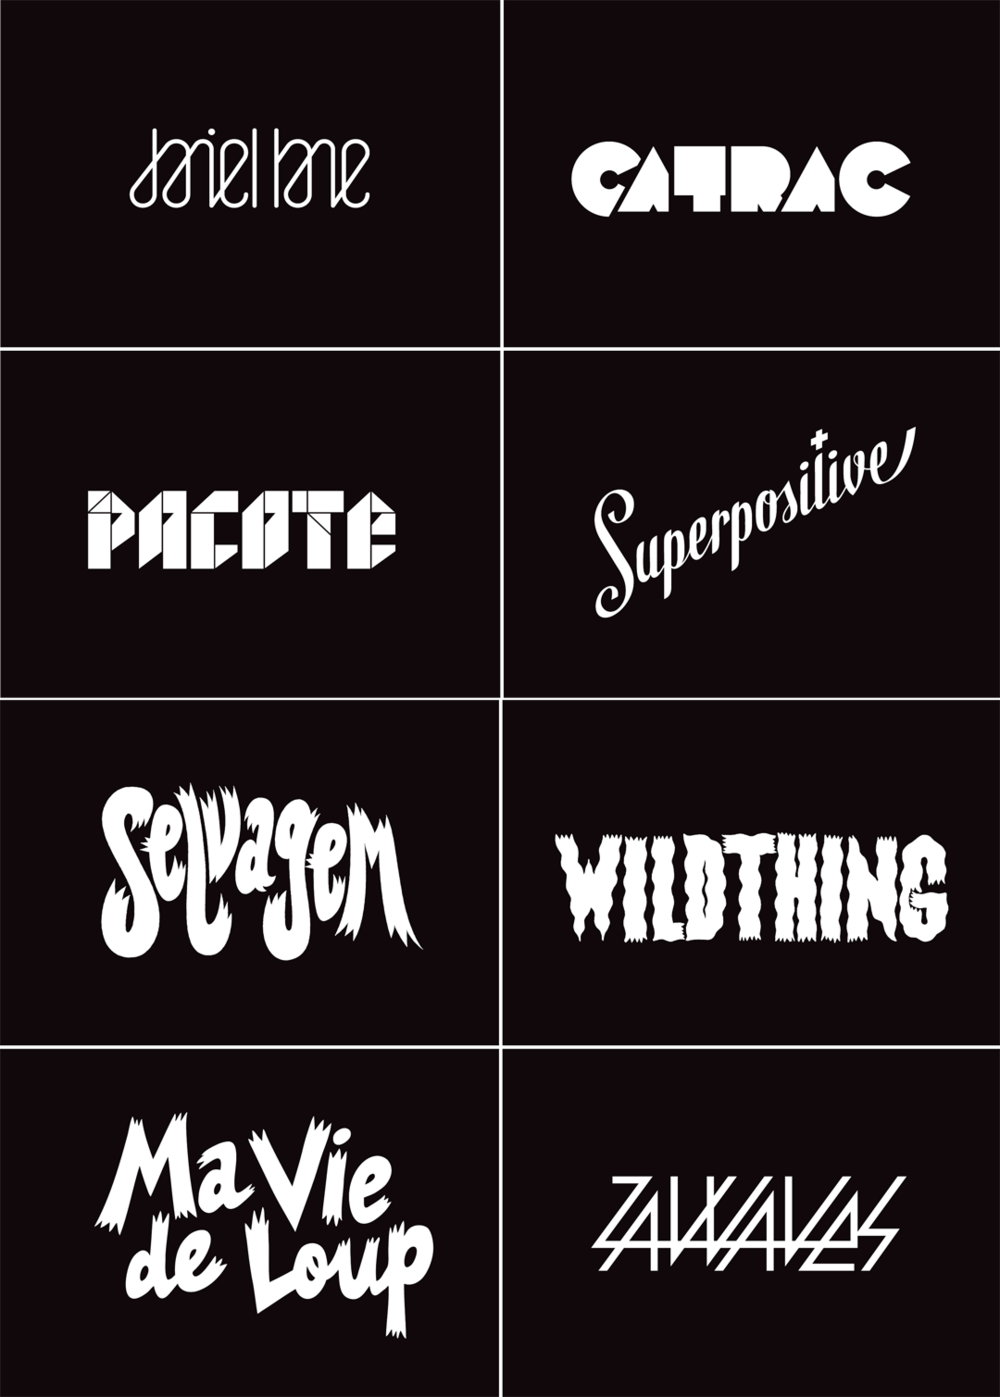 claytonjrstudio_logos00.png